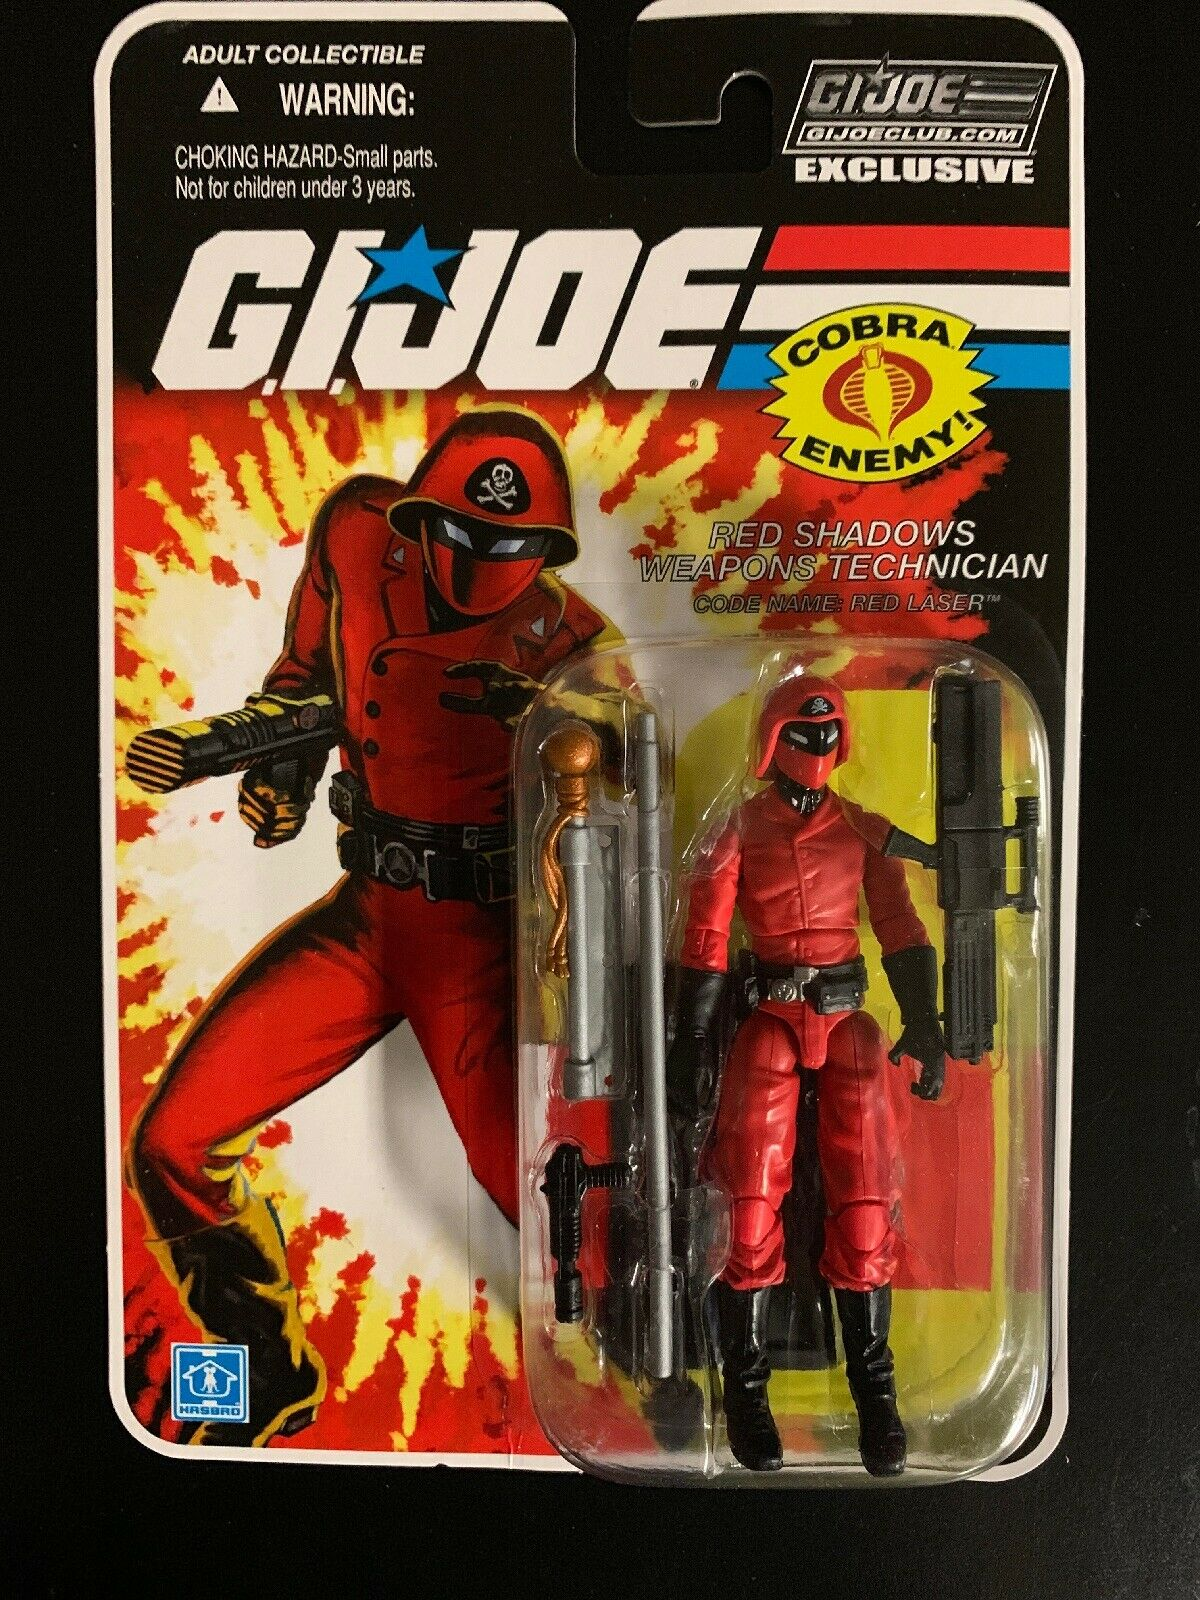 Gi Joe FSS 8.0 02 Laser Rojo Rojo Sombras armas técnico Menta en paquete sellado